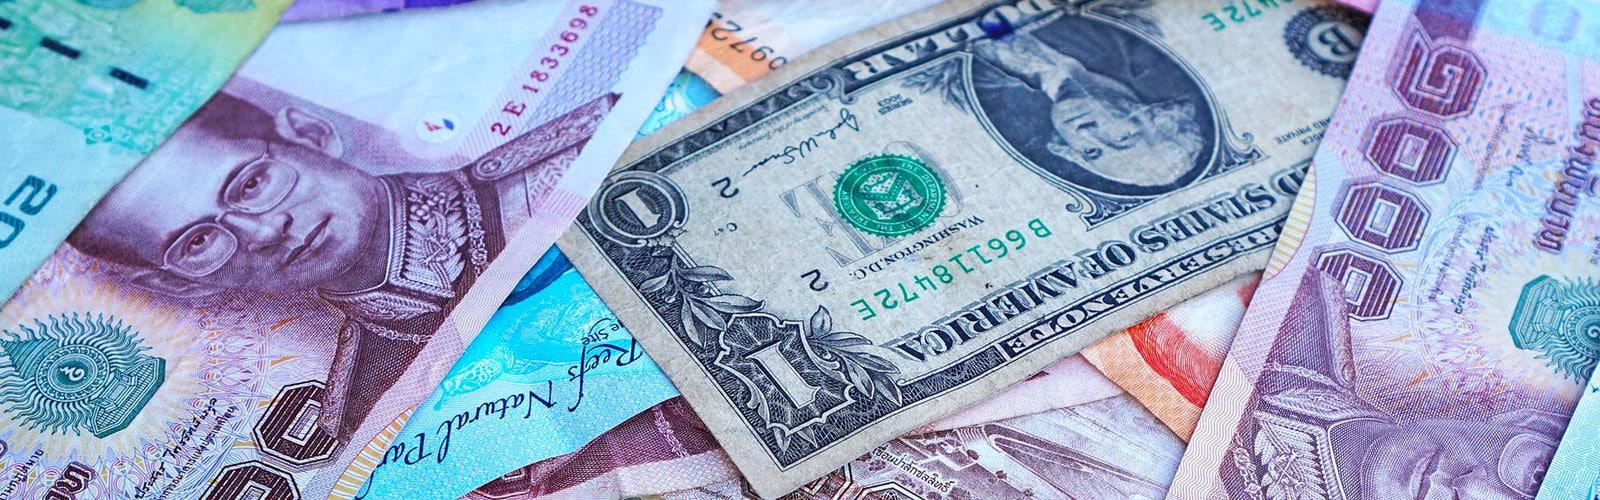 Mexican Peso Exchange Rate At Los Cabos